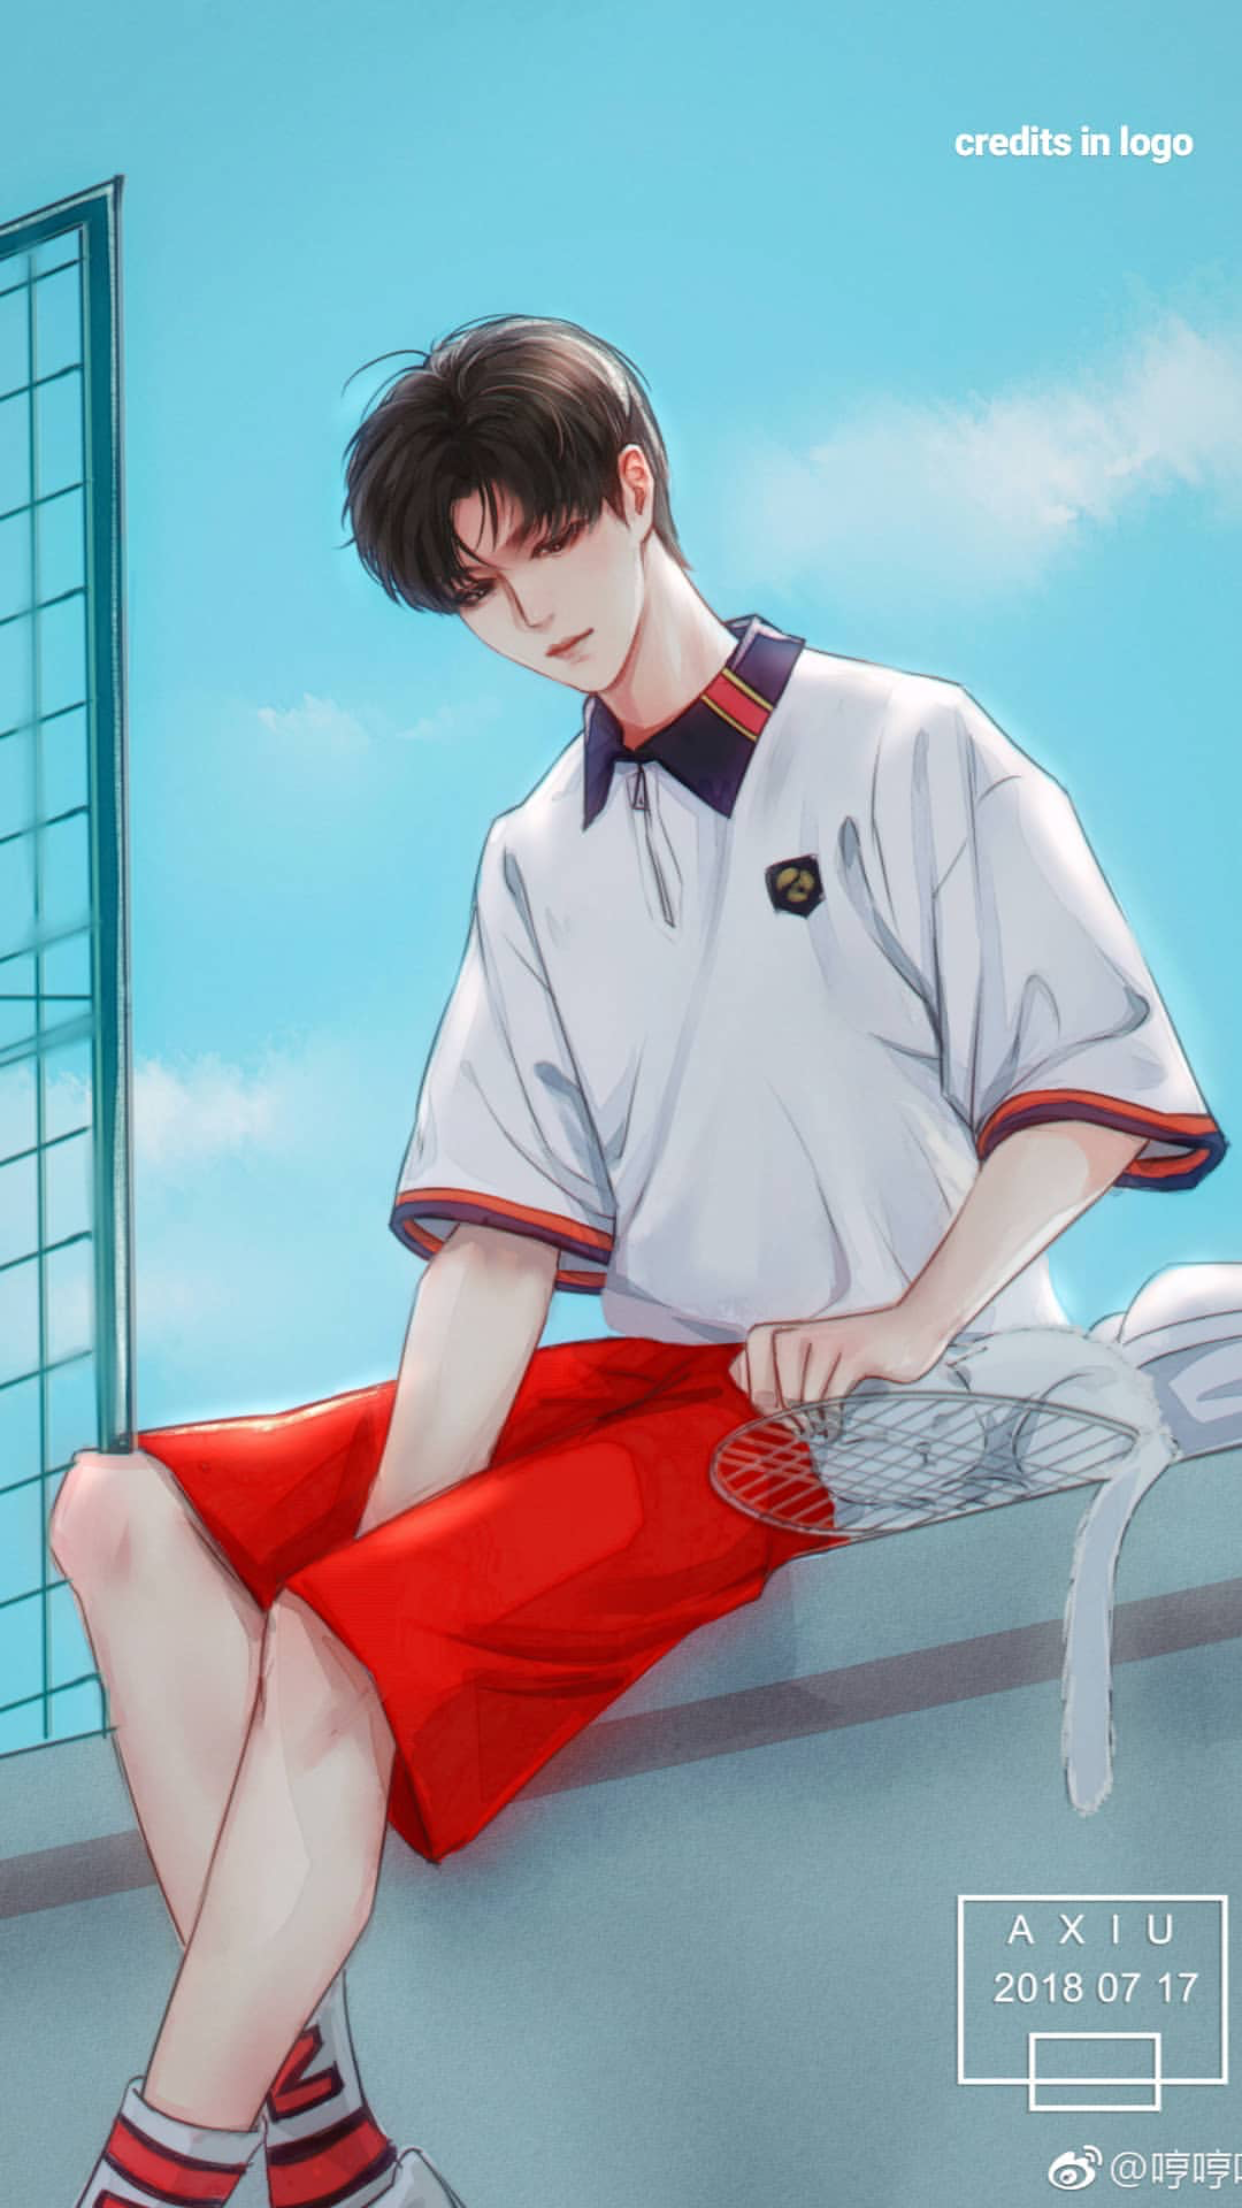 صور اولاد انمي كوريين Anime Drawings Boy Handsome Anime Anime Guys